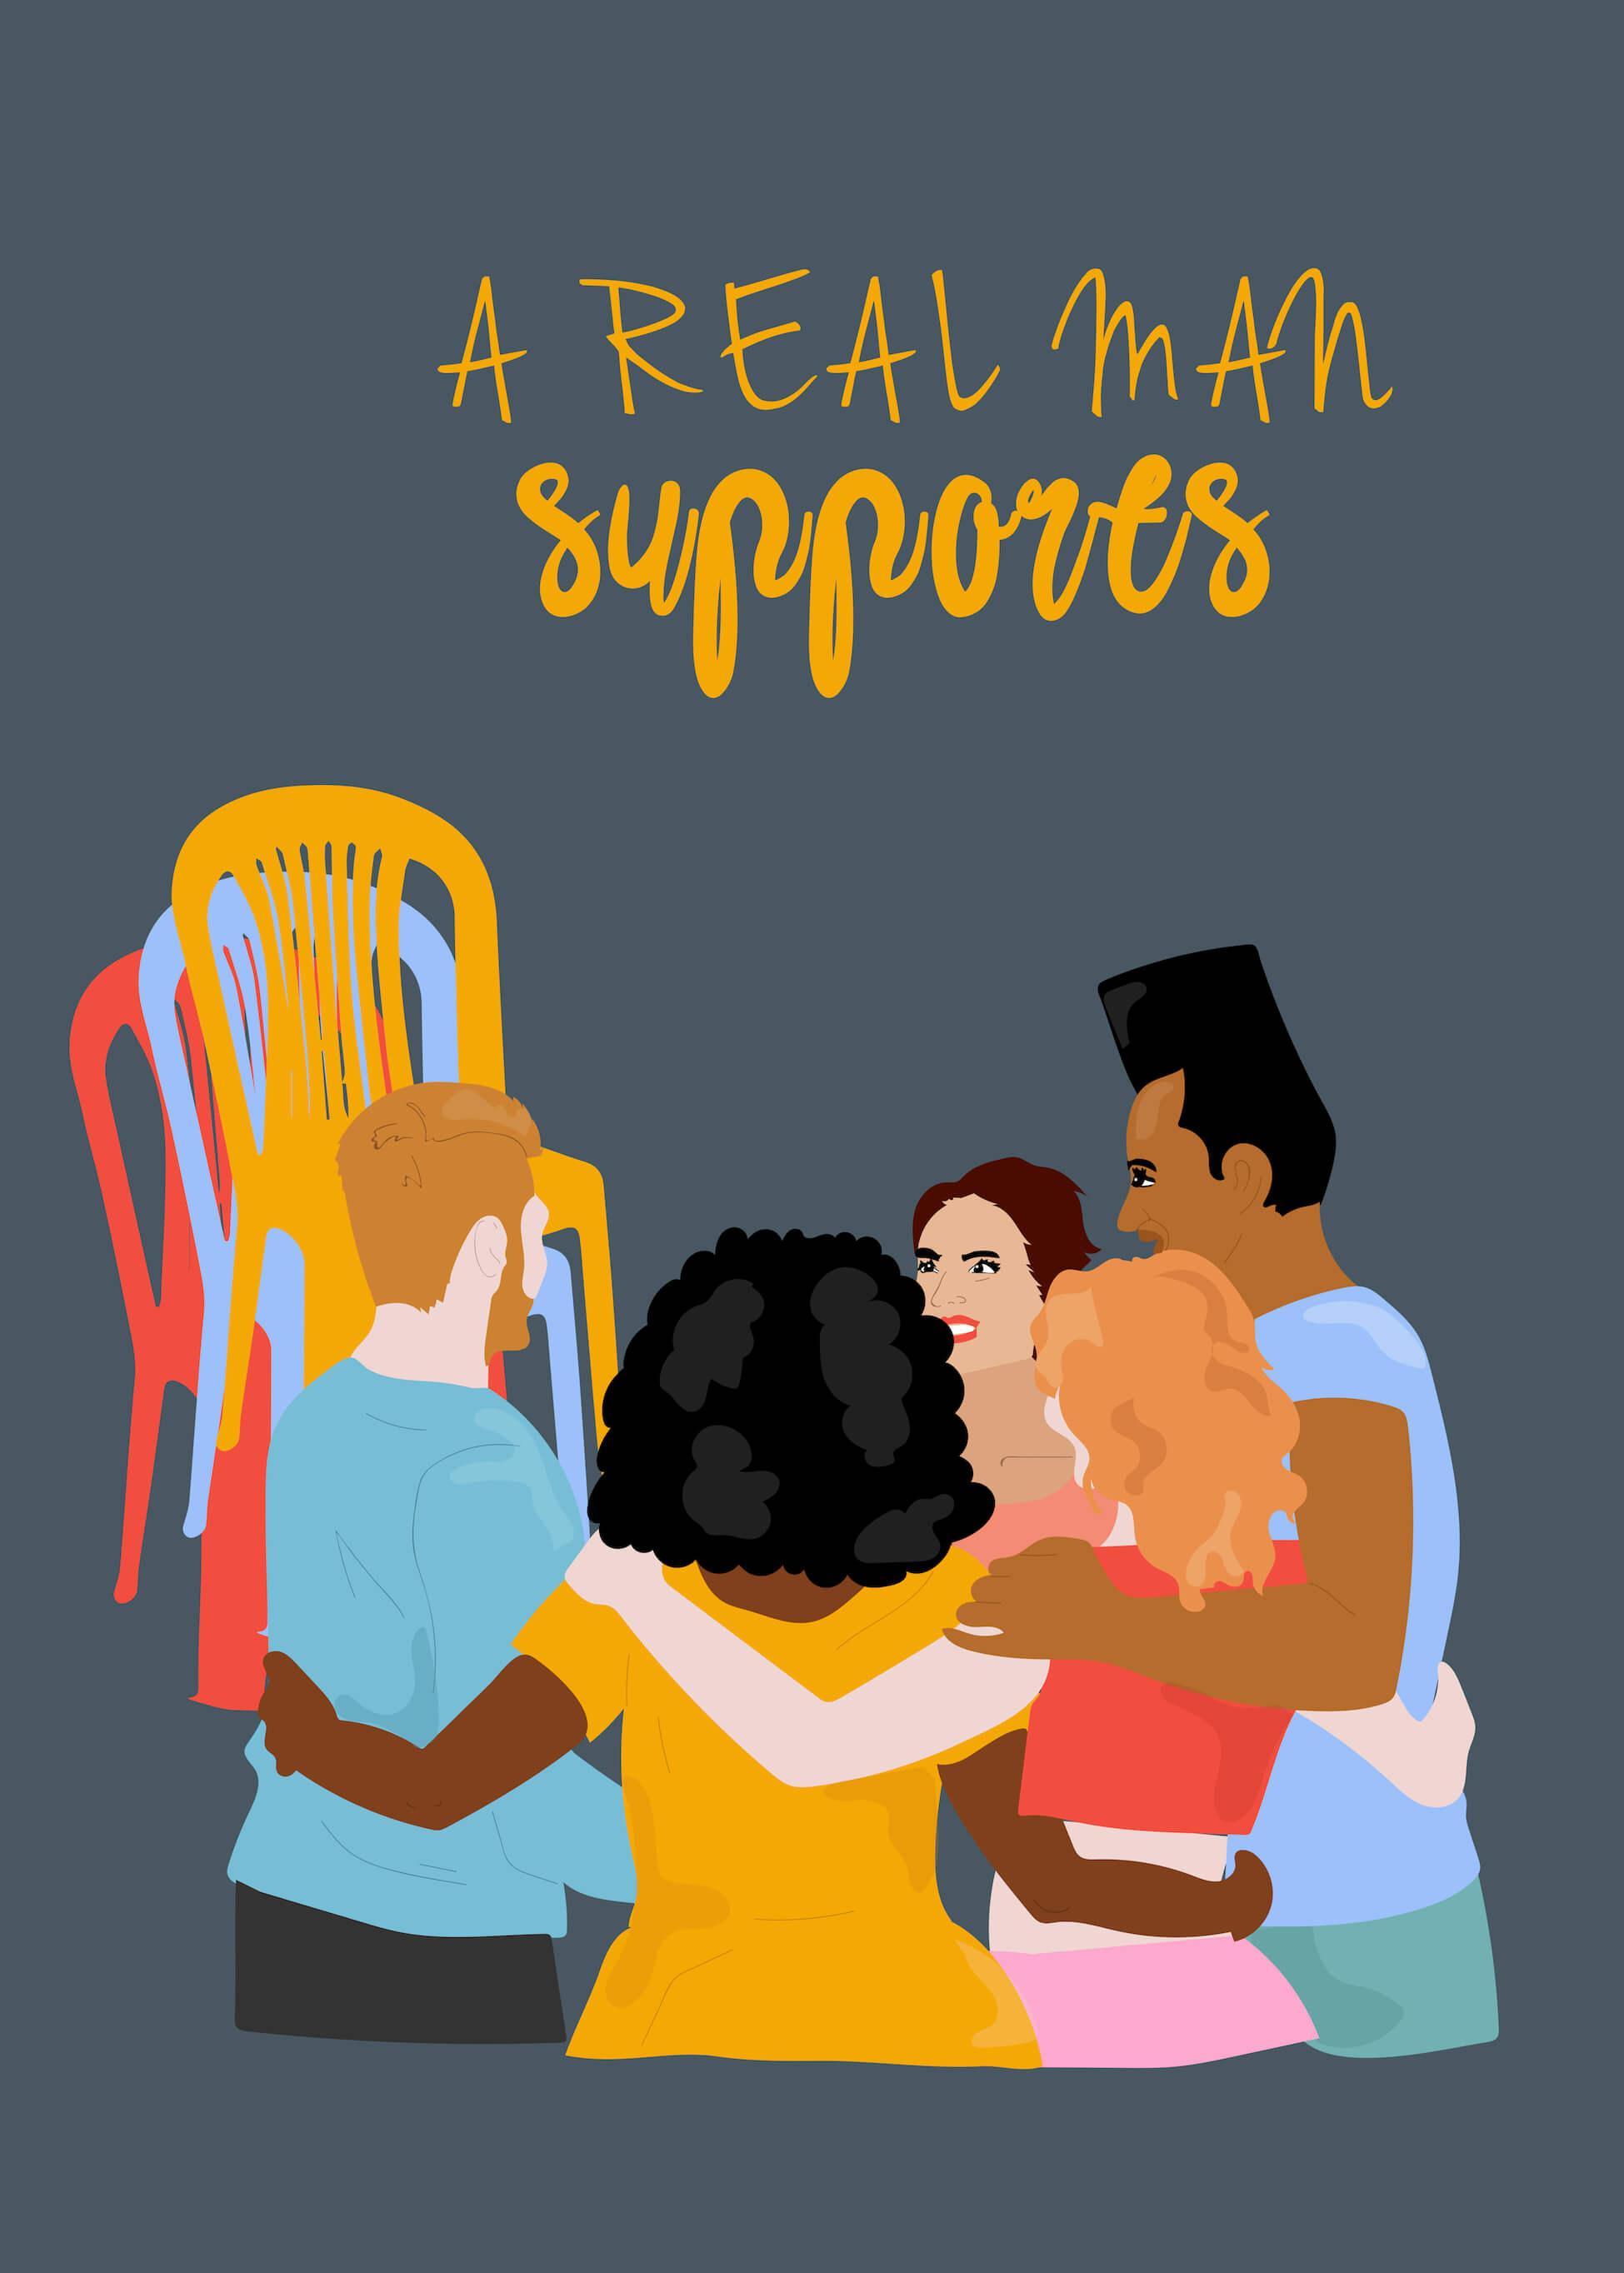 A Real Man Supports main image